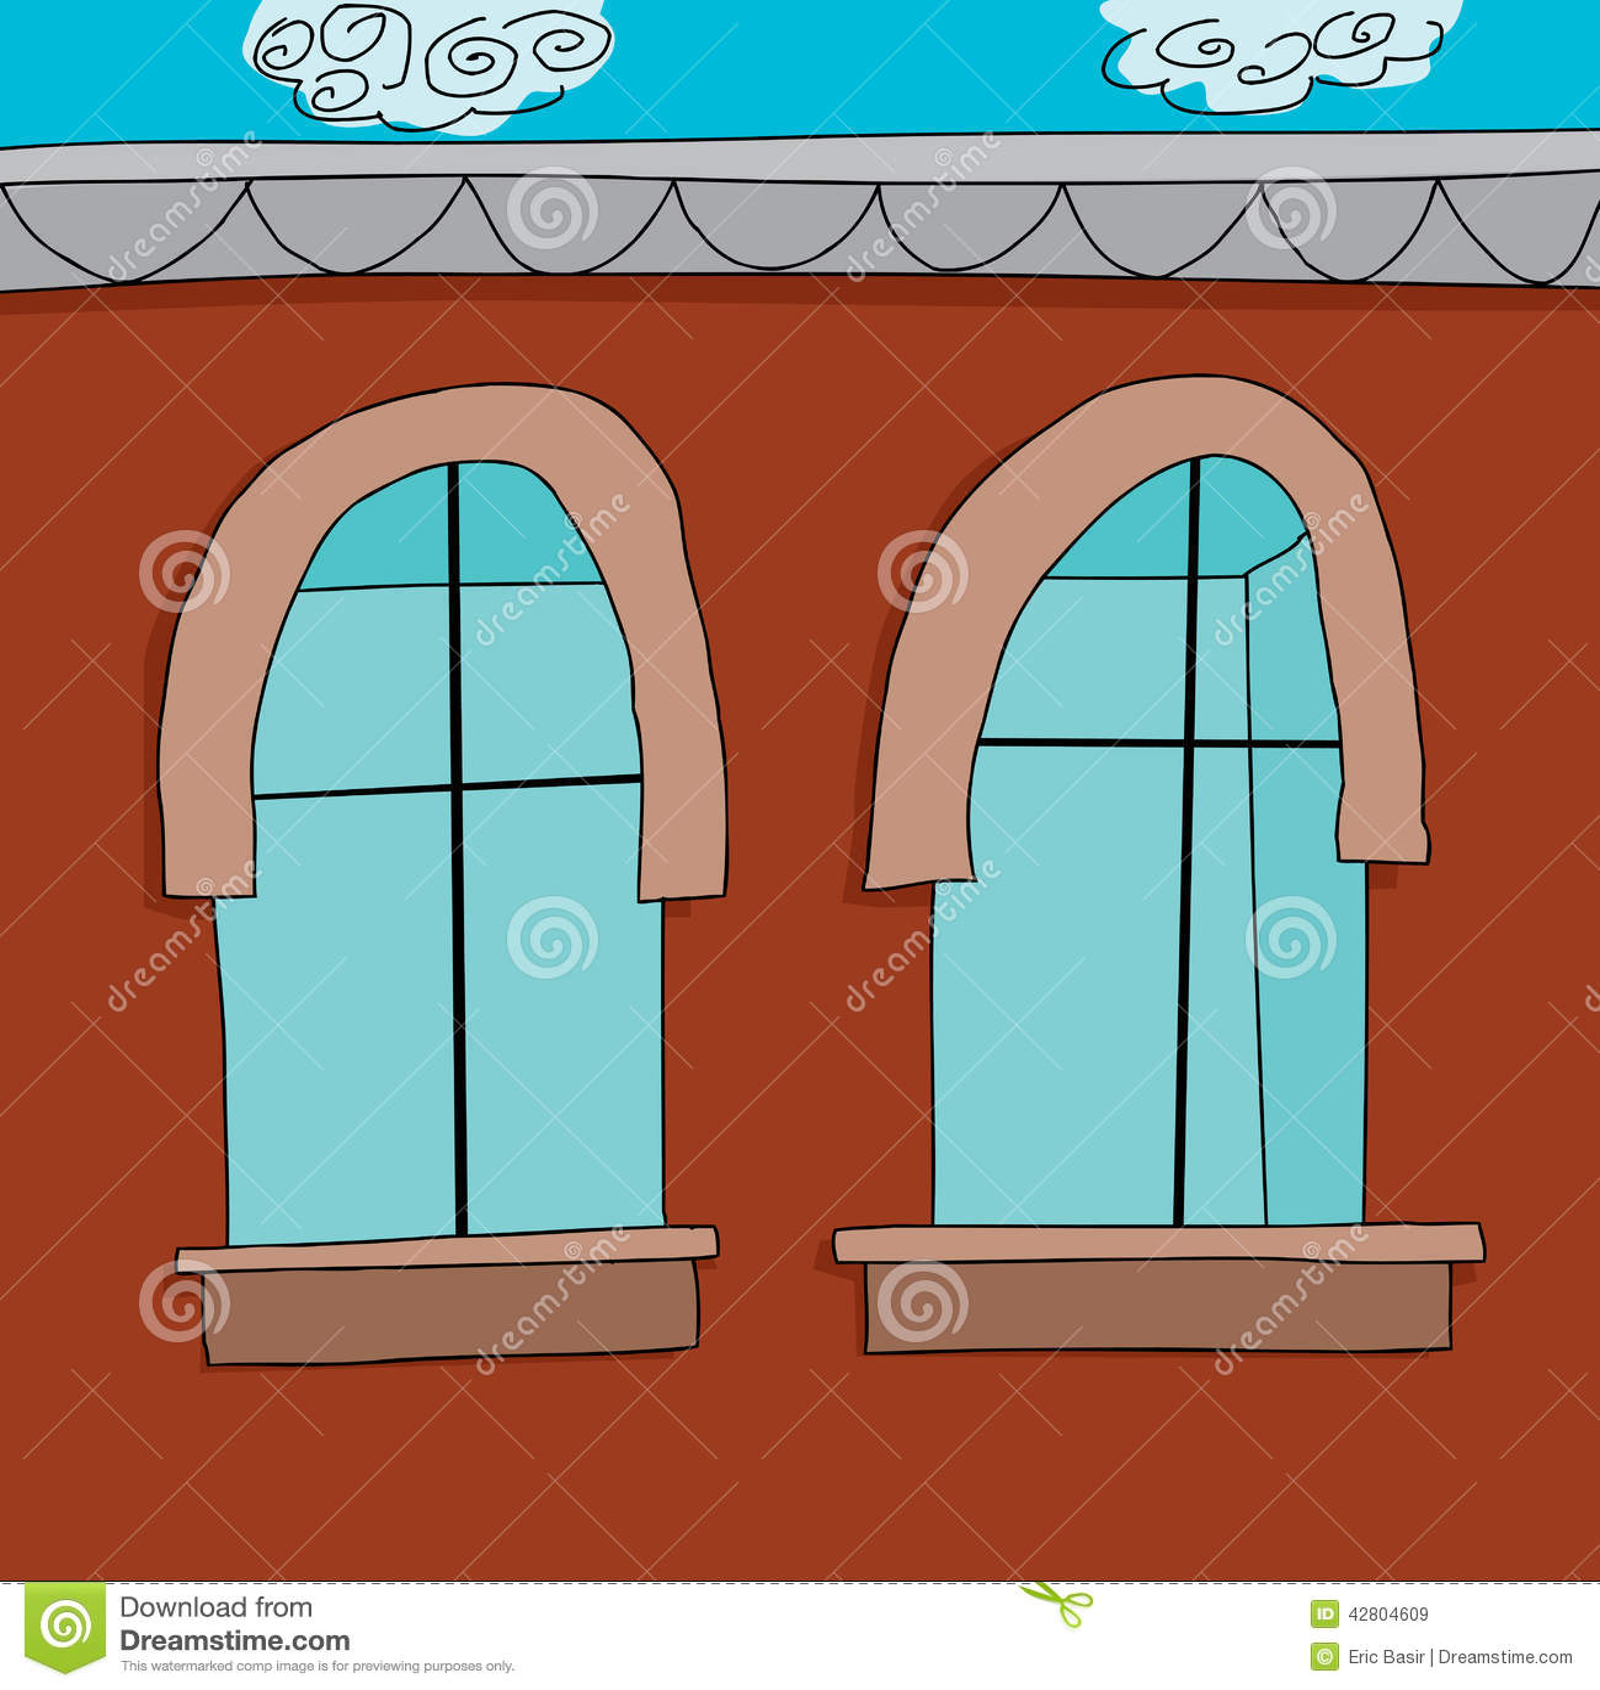 Empty Cupboard Cartoon: Empty Apartment Cartoon Stock Vector